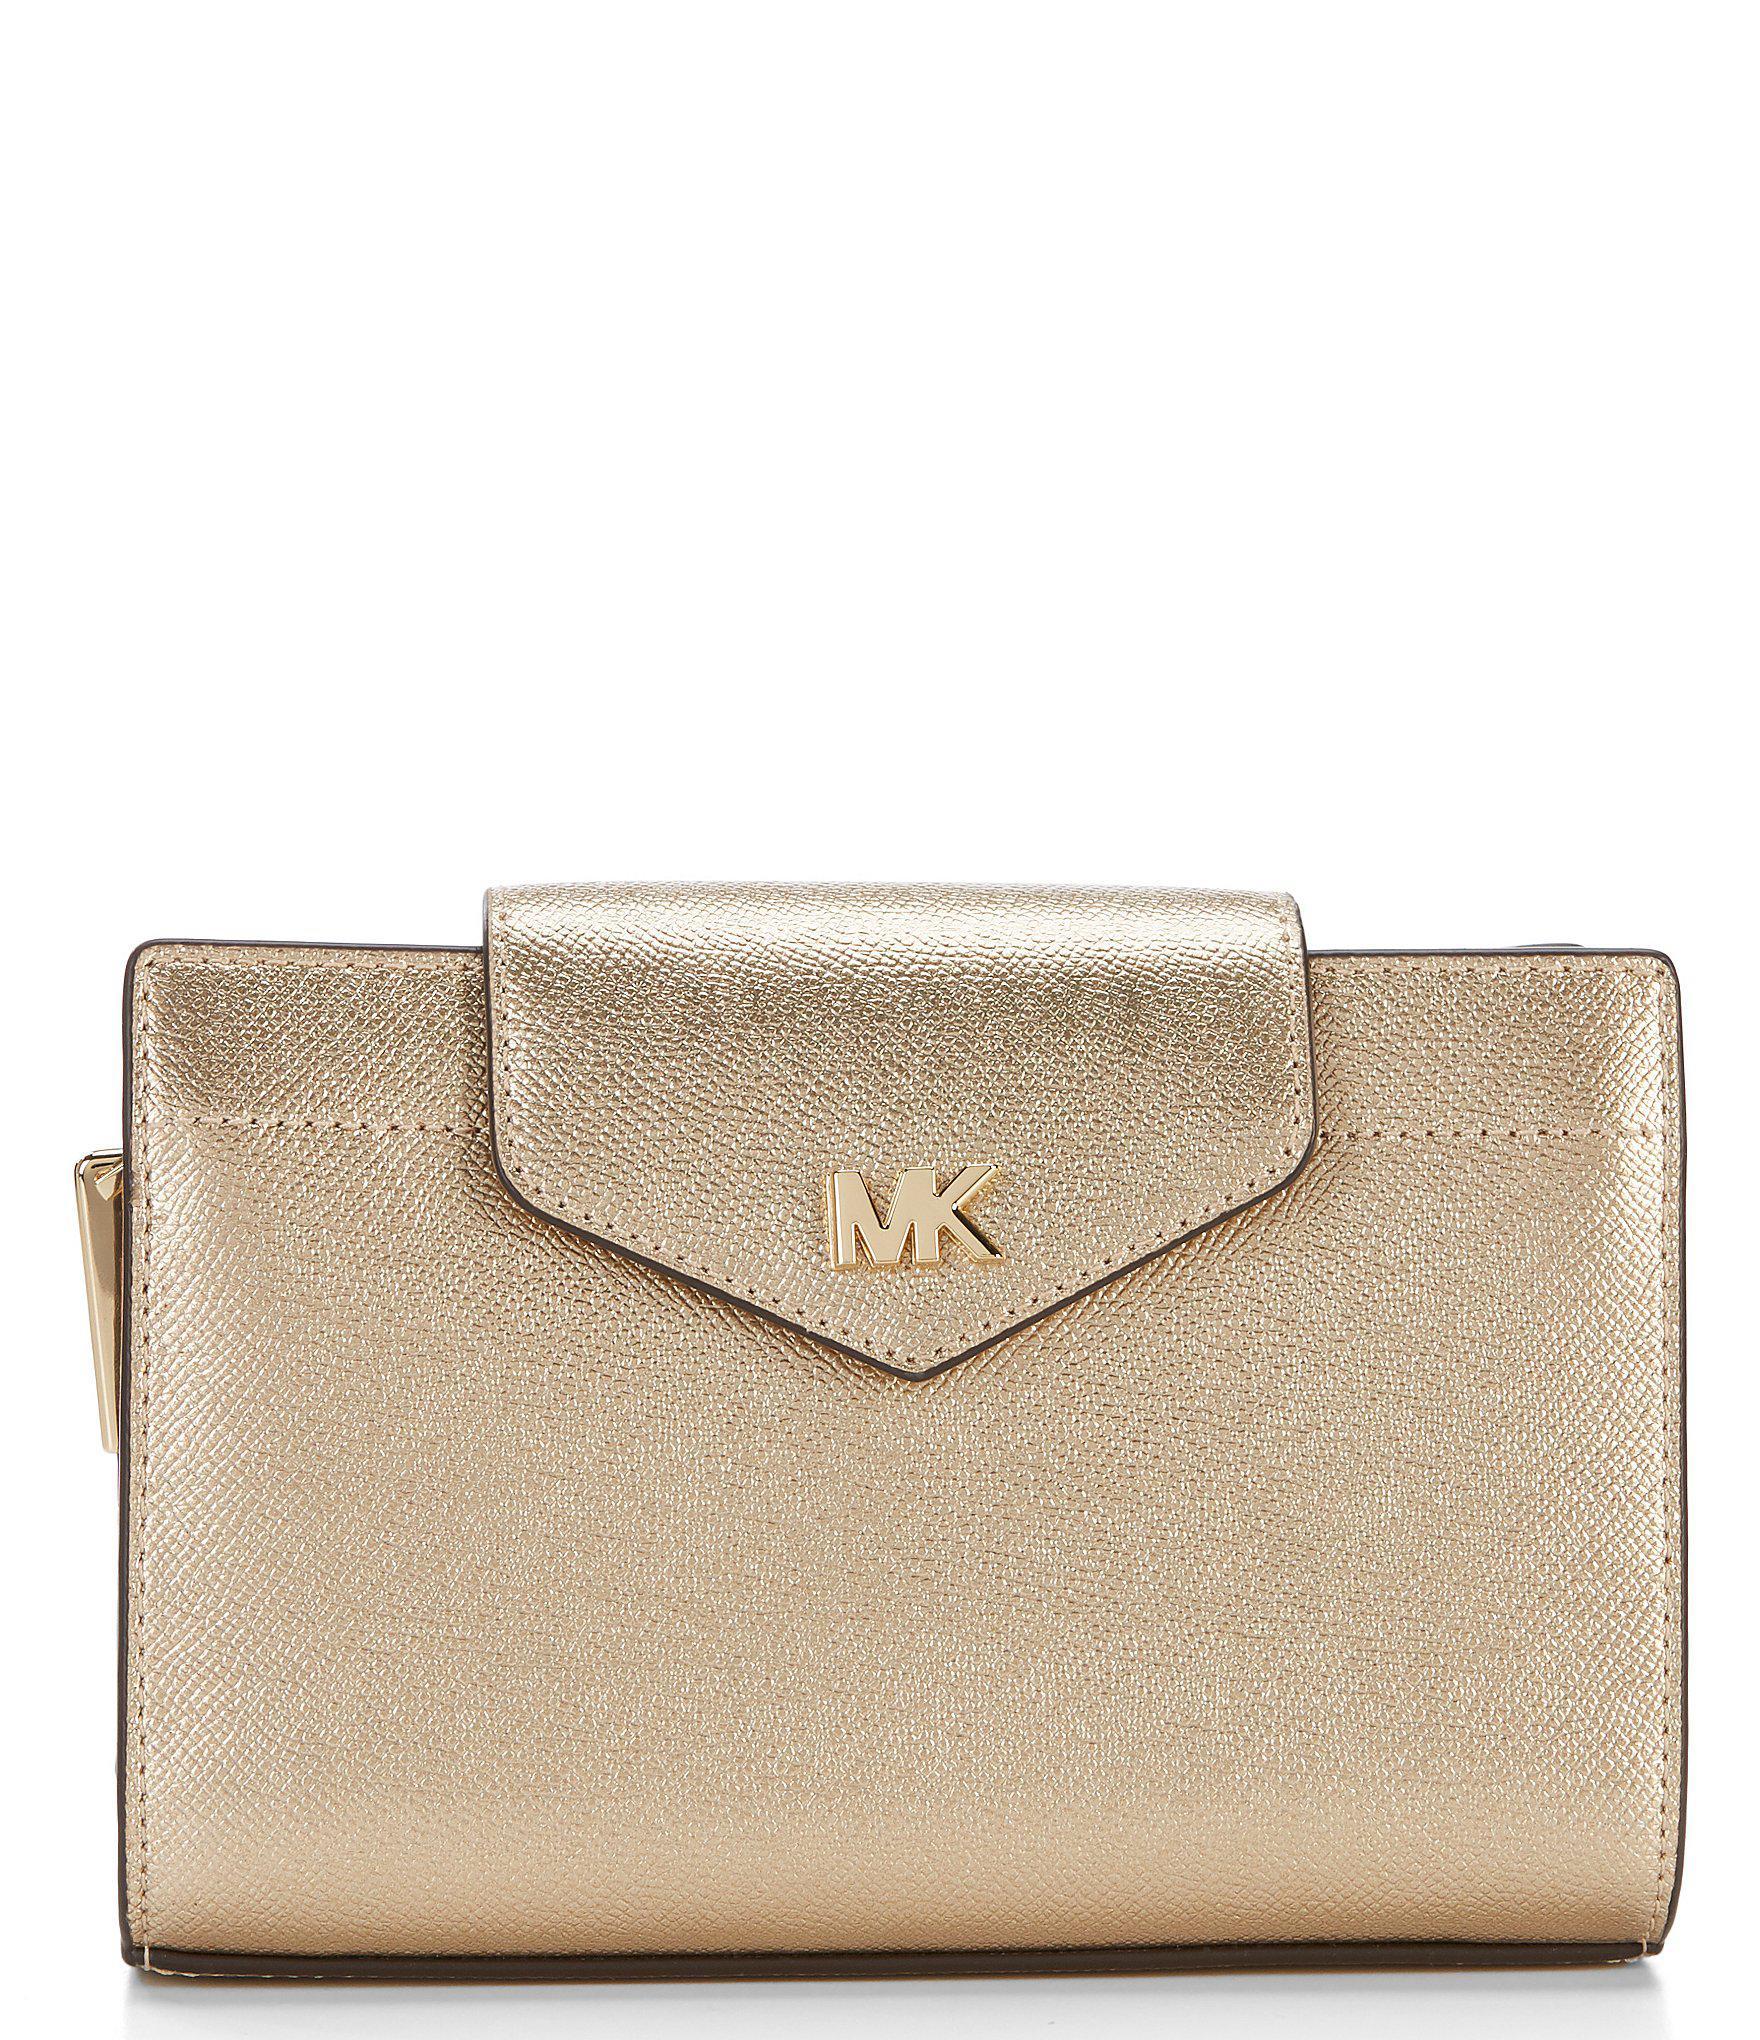 94158168fa9d MICHAEL Michael Kors. Women s Medium Convertible Flap Metallic Cross-body  Clutch